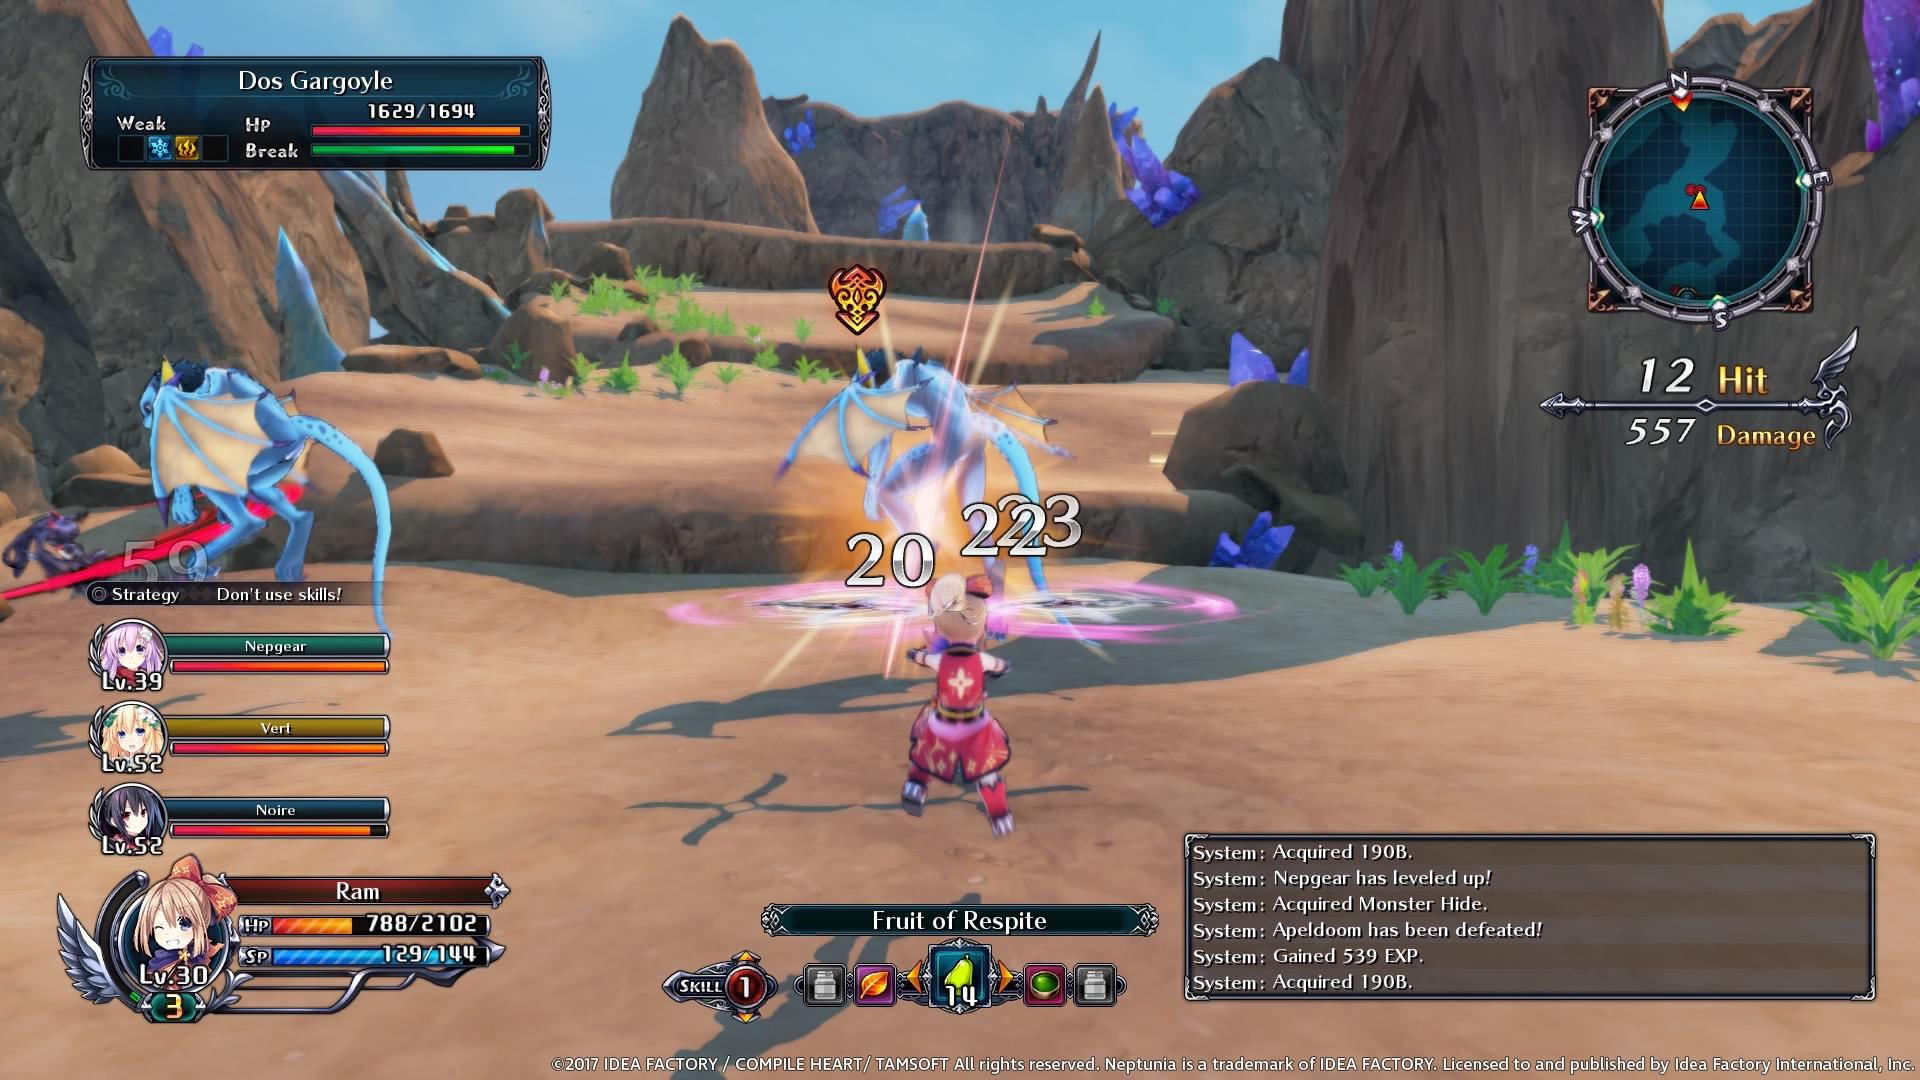 Onlineovka Cyberdimension Neptunia: 4 Goddesses Online nakonec vyjde už v půlce října 148384